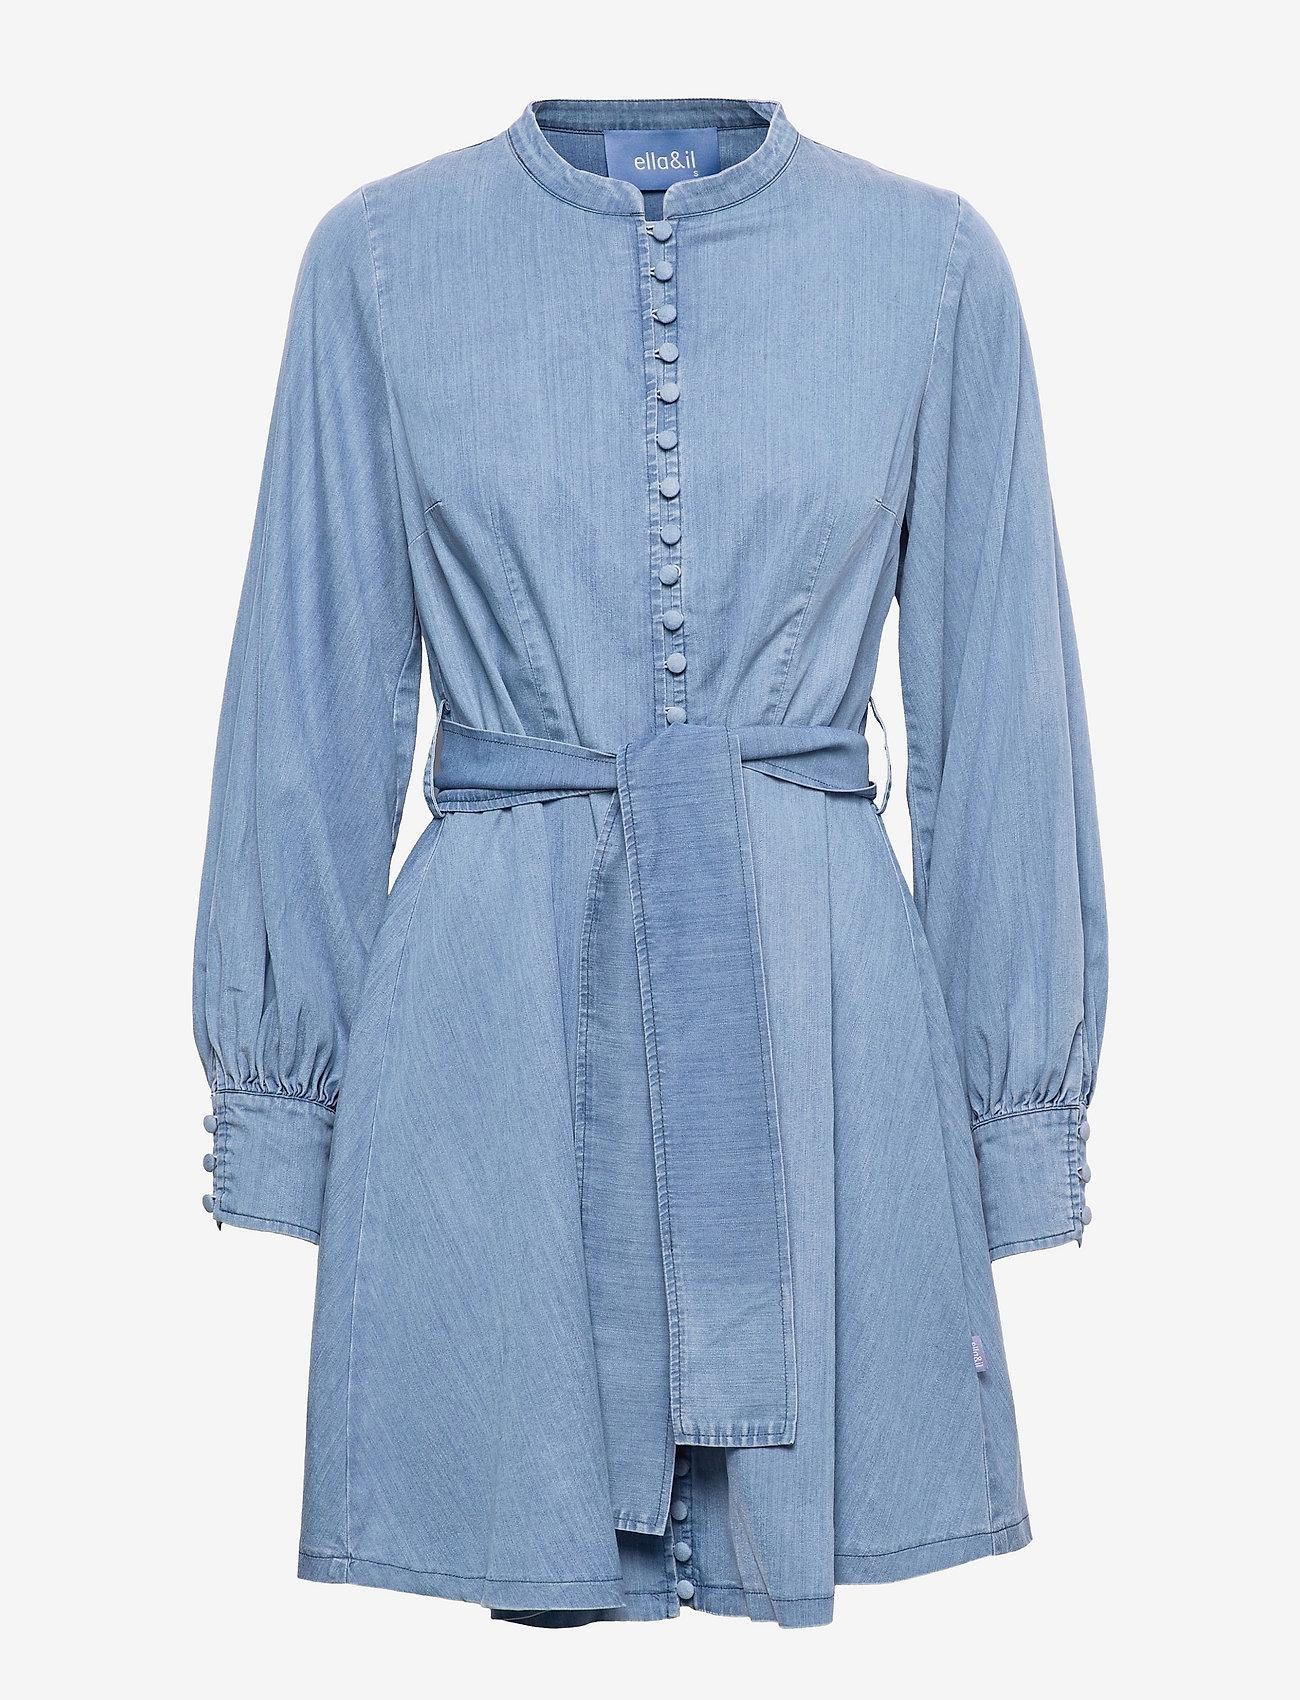 ella&il - Zena denim dress - robes de jour - blue denim - 0